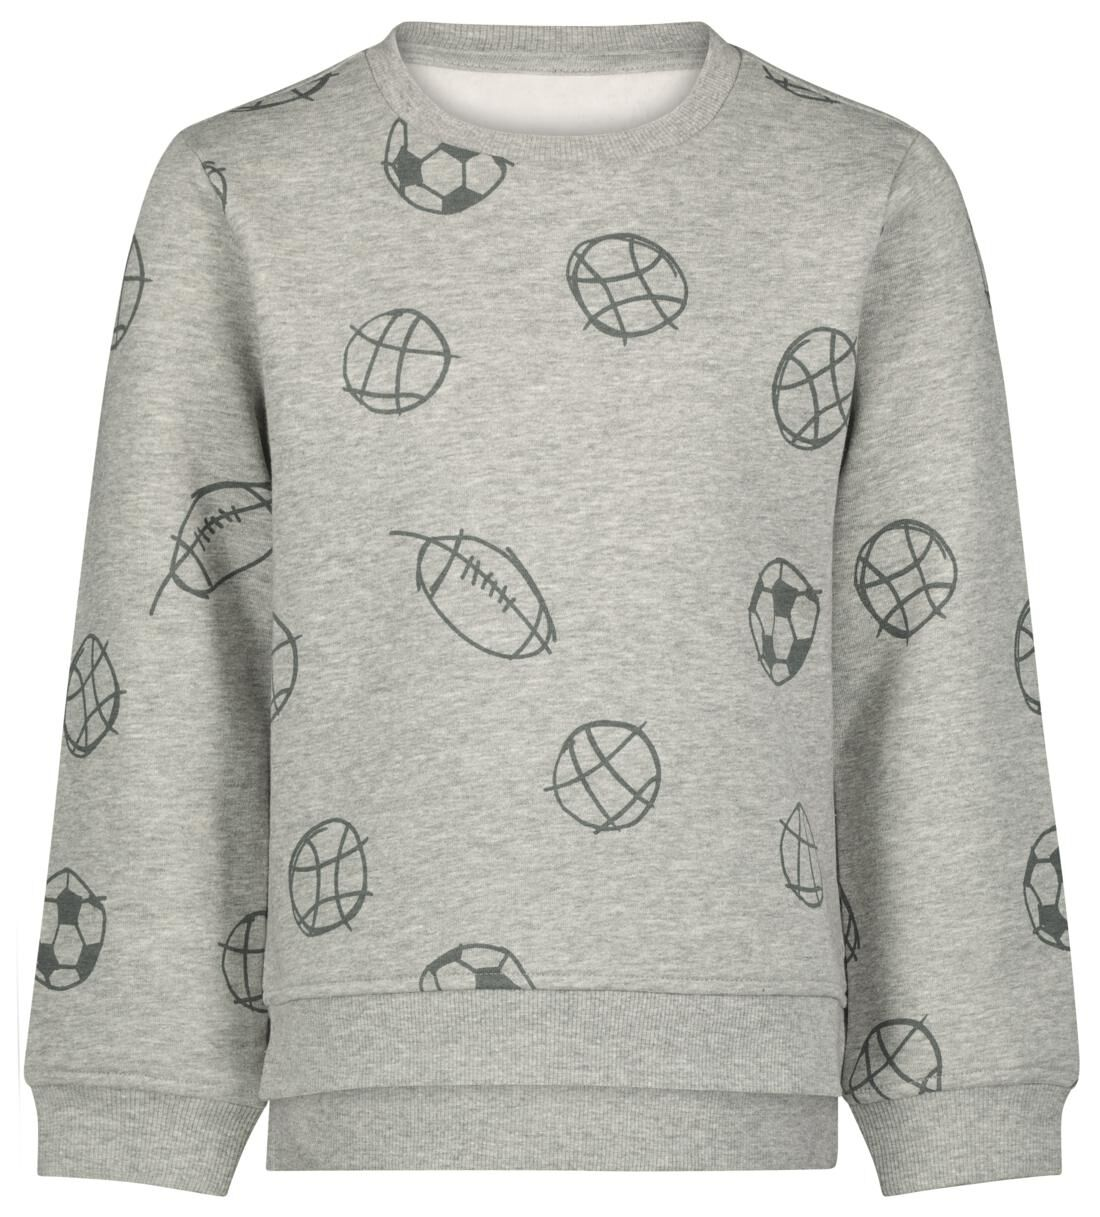 HEMA Kindersweater Sport Grijsmelange (grijsmelange)